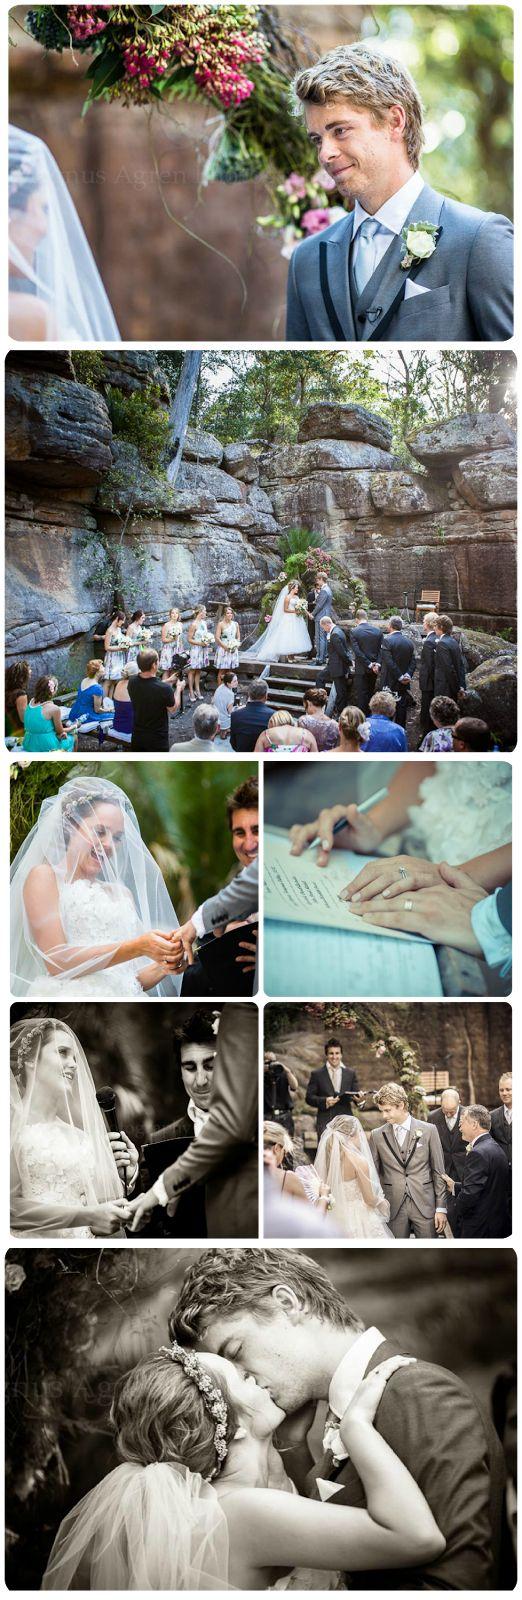 Rustique Weddings: {Celebrity Wedding} Rebecca Breeds + Luke Mitchell...